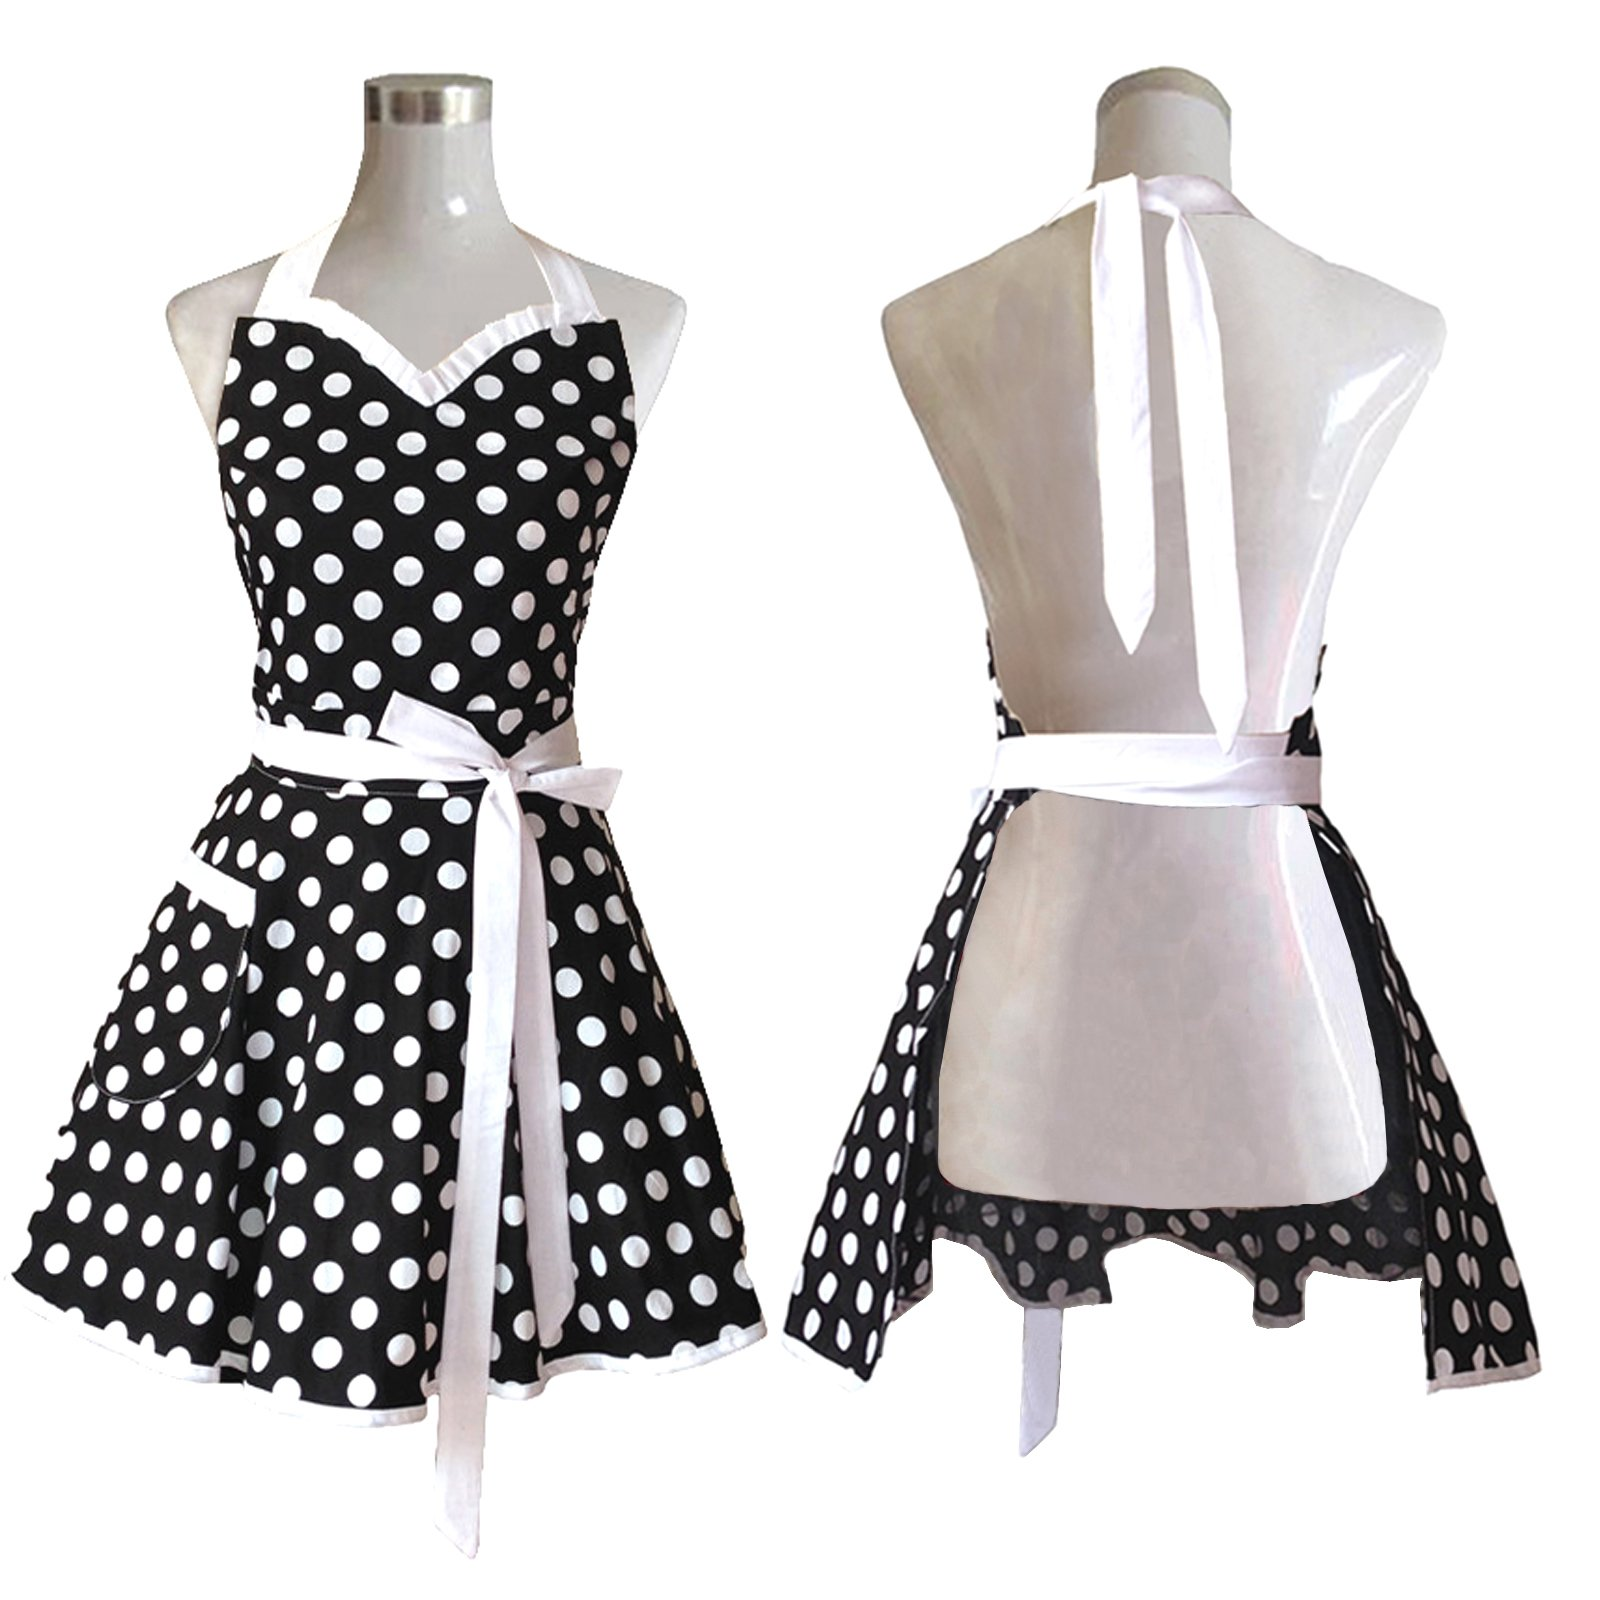 Lovely Sweetheart Black Retro Kitchen Aprons Woman Girl Cotton Polka Dot Cooking Salon Pinafore Vintage Apron Dress Gift